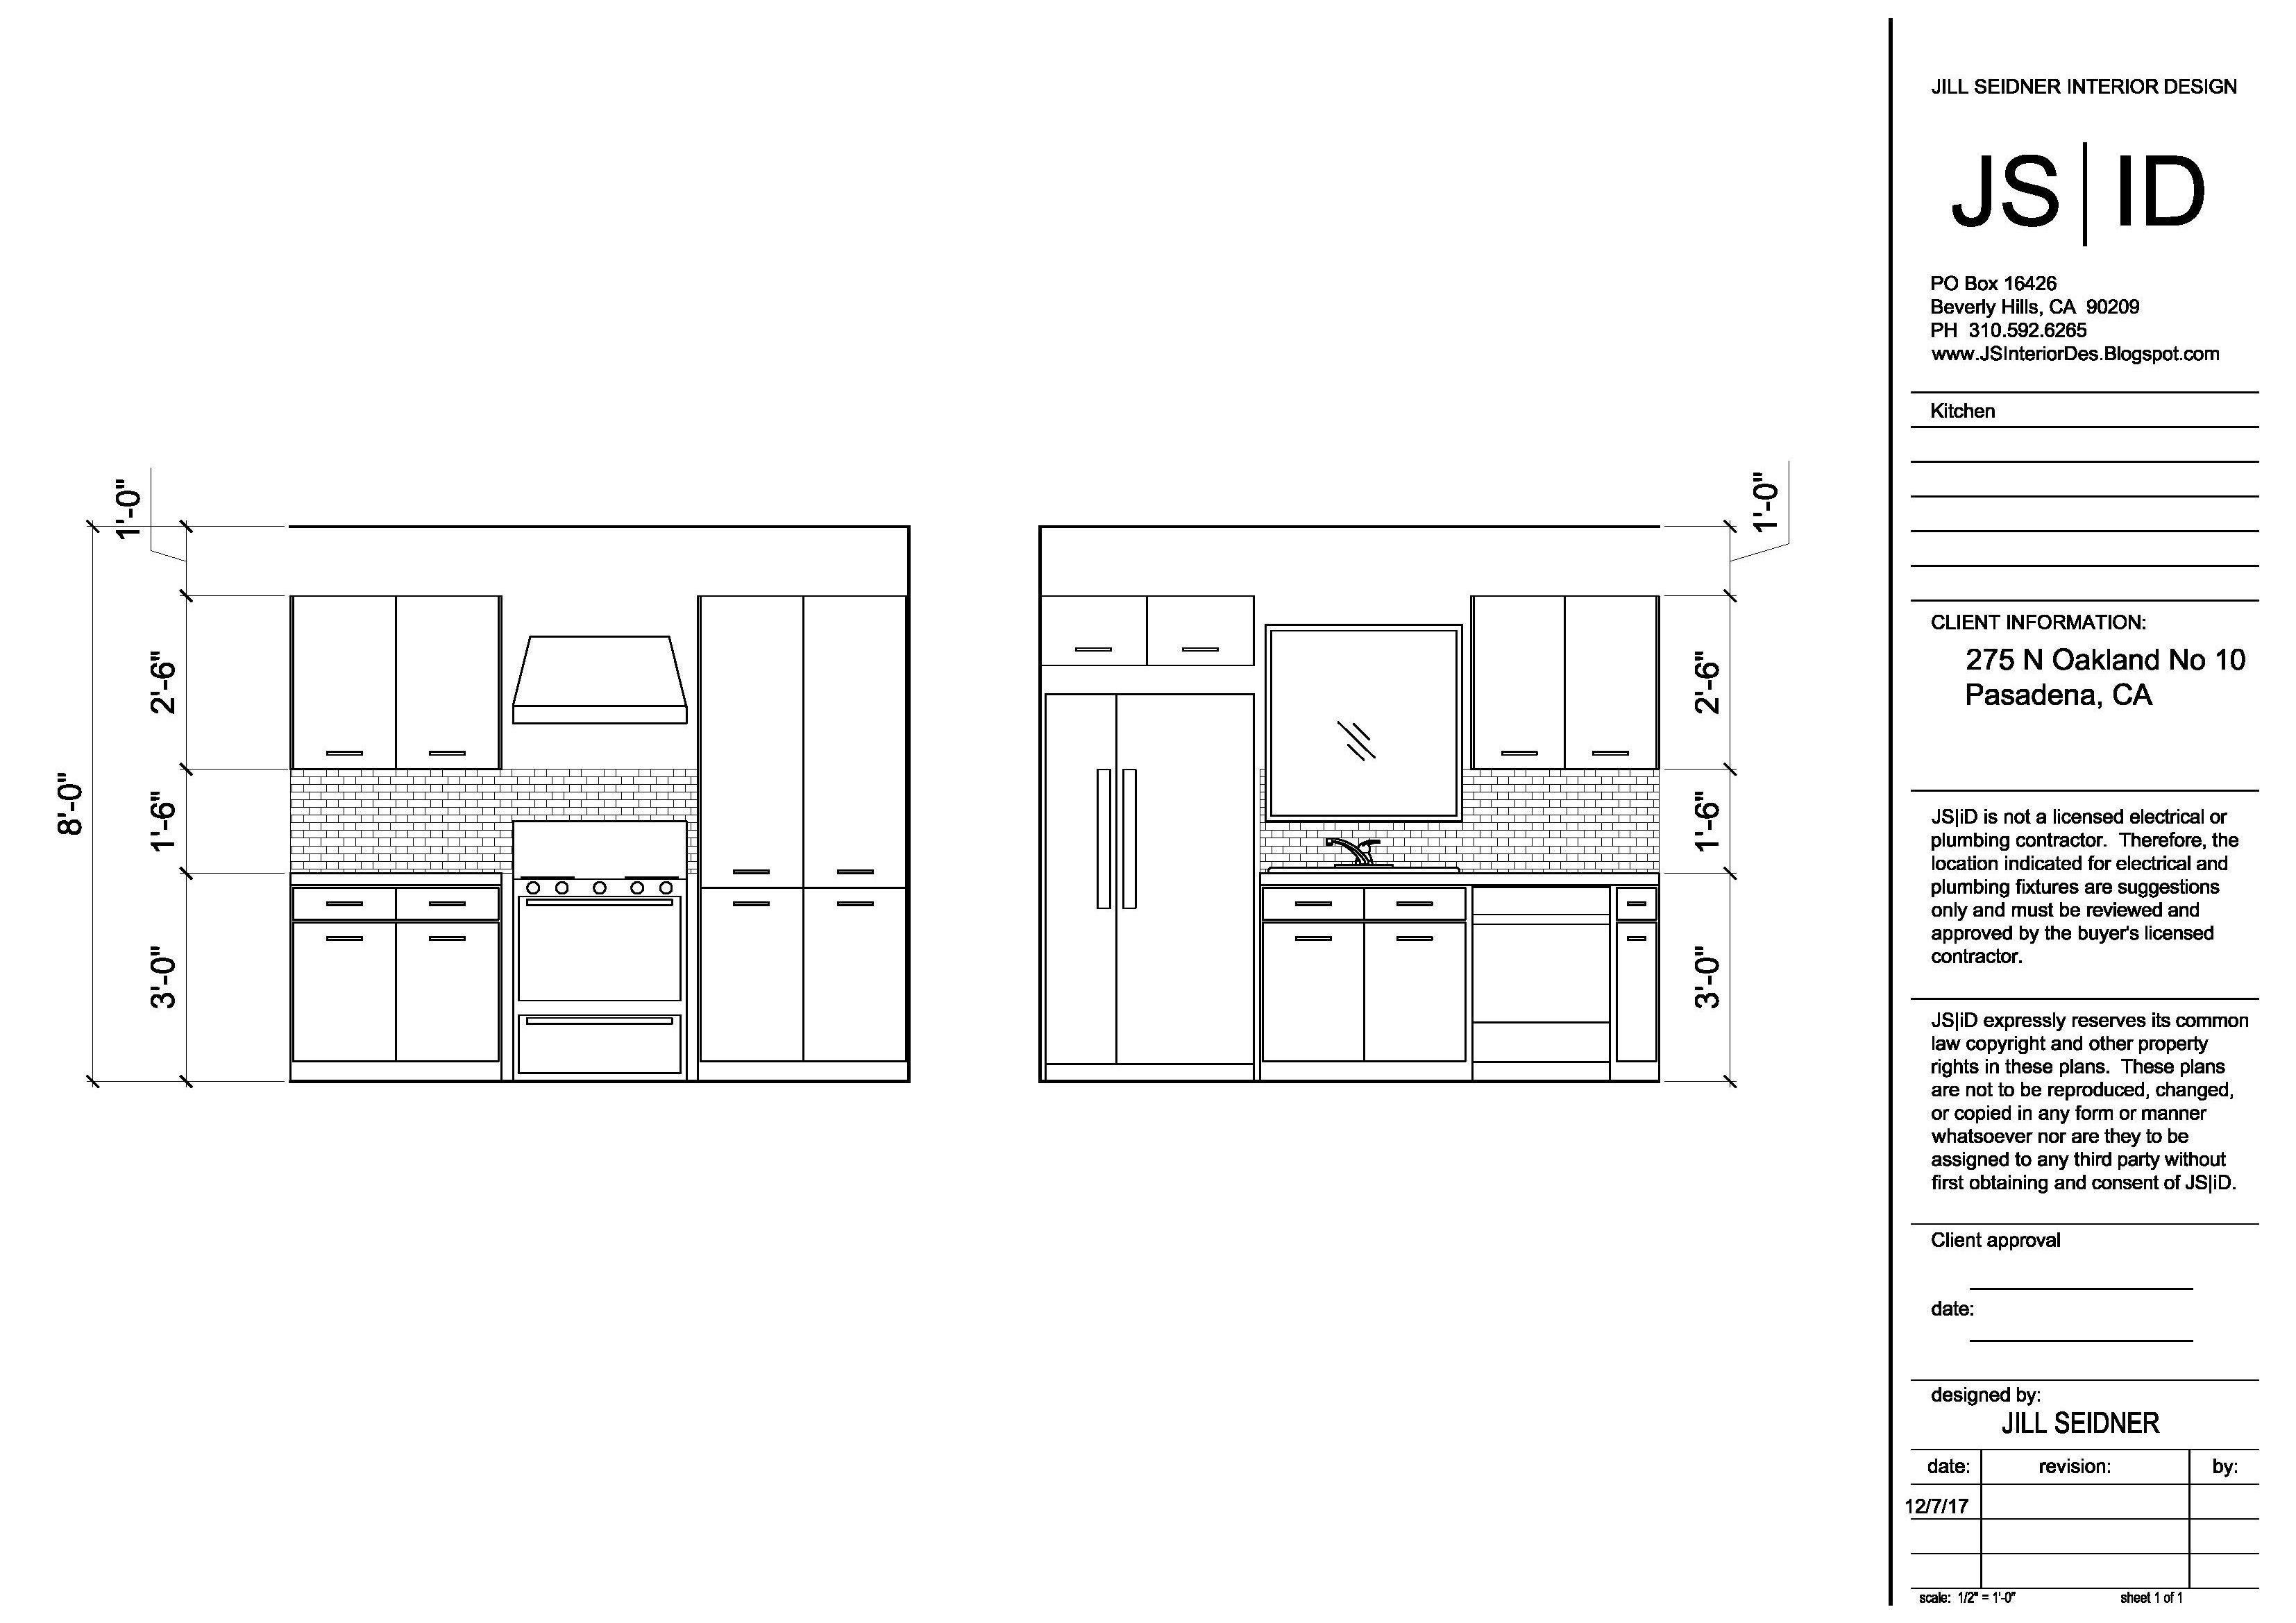 Pasadena, CA Tenant Improvement Project Kitchen Elevation